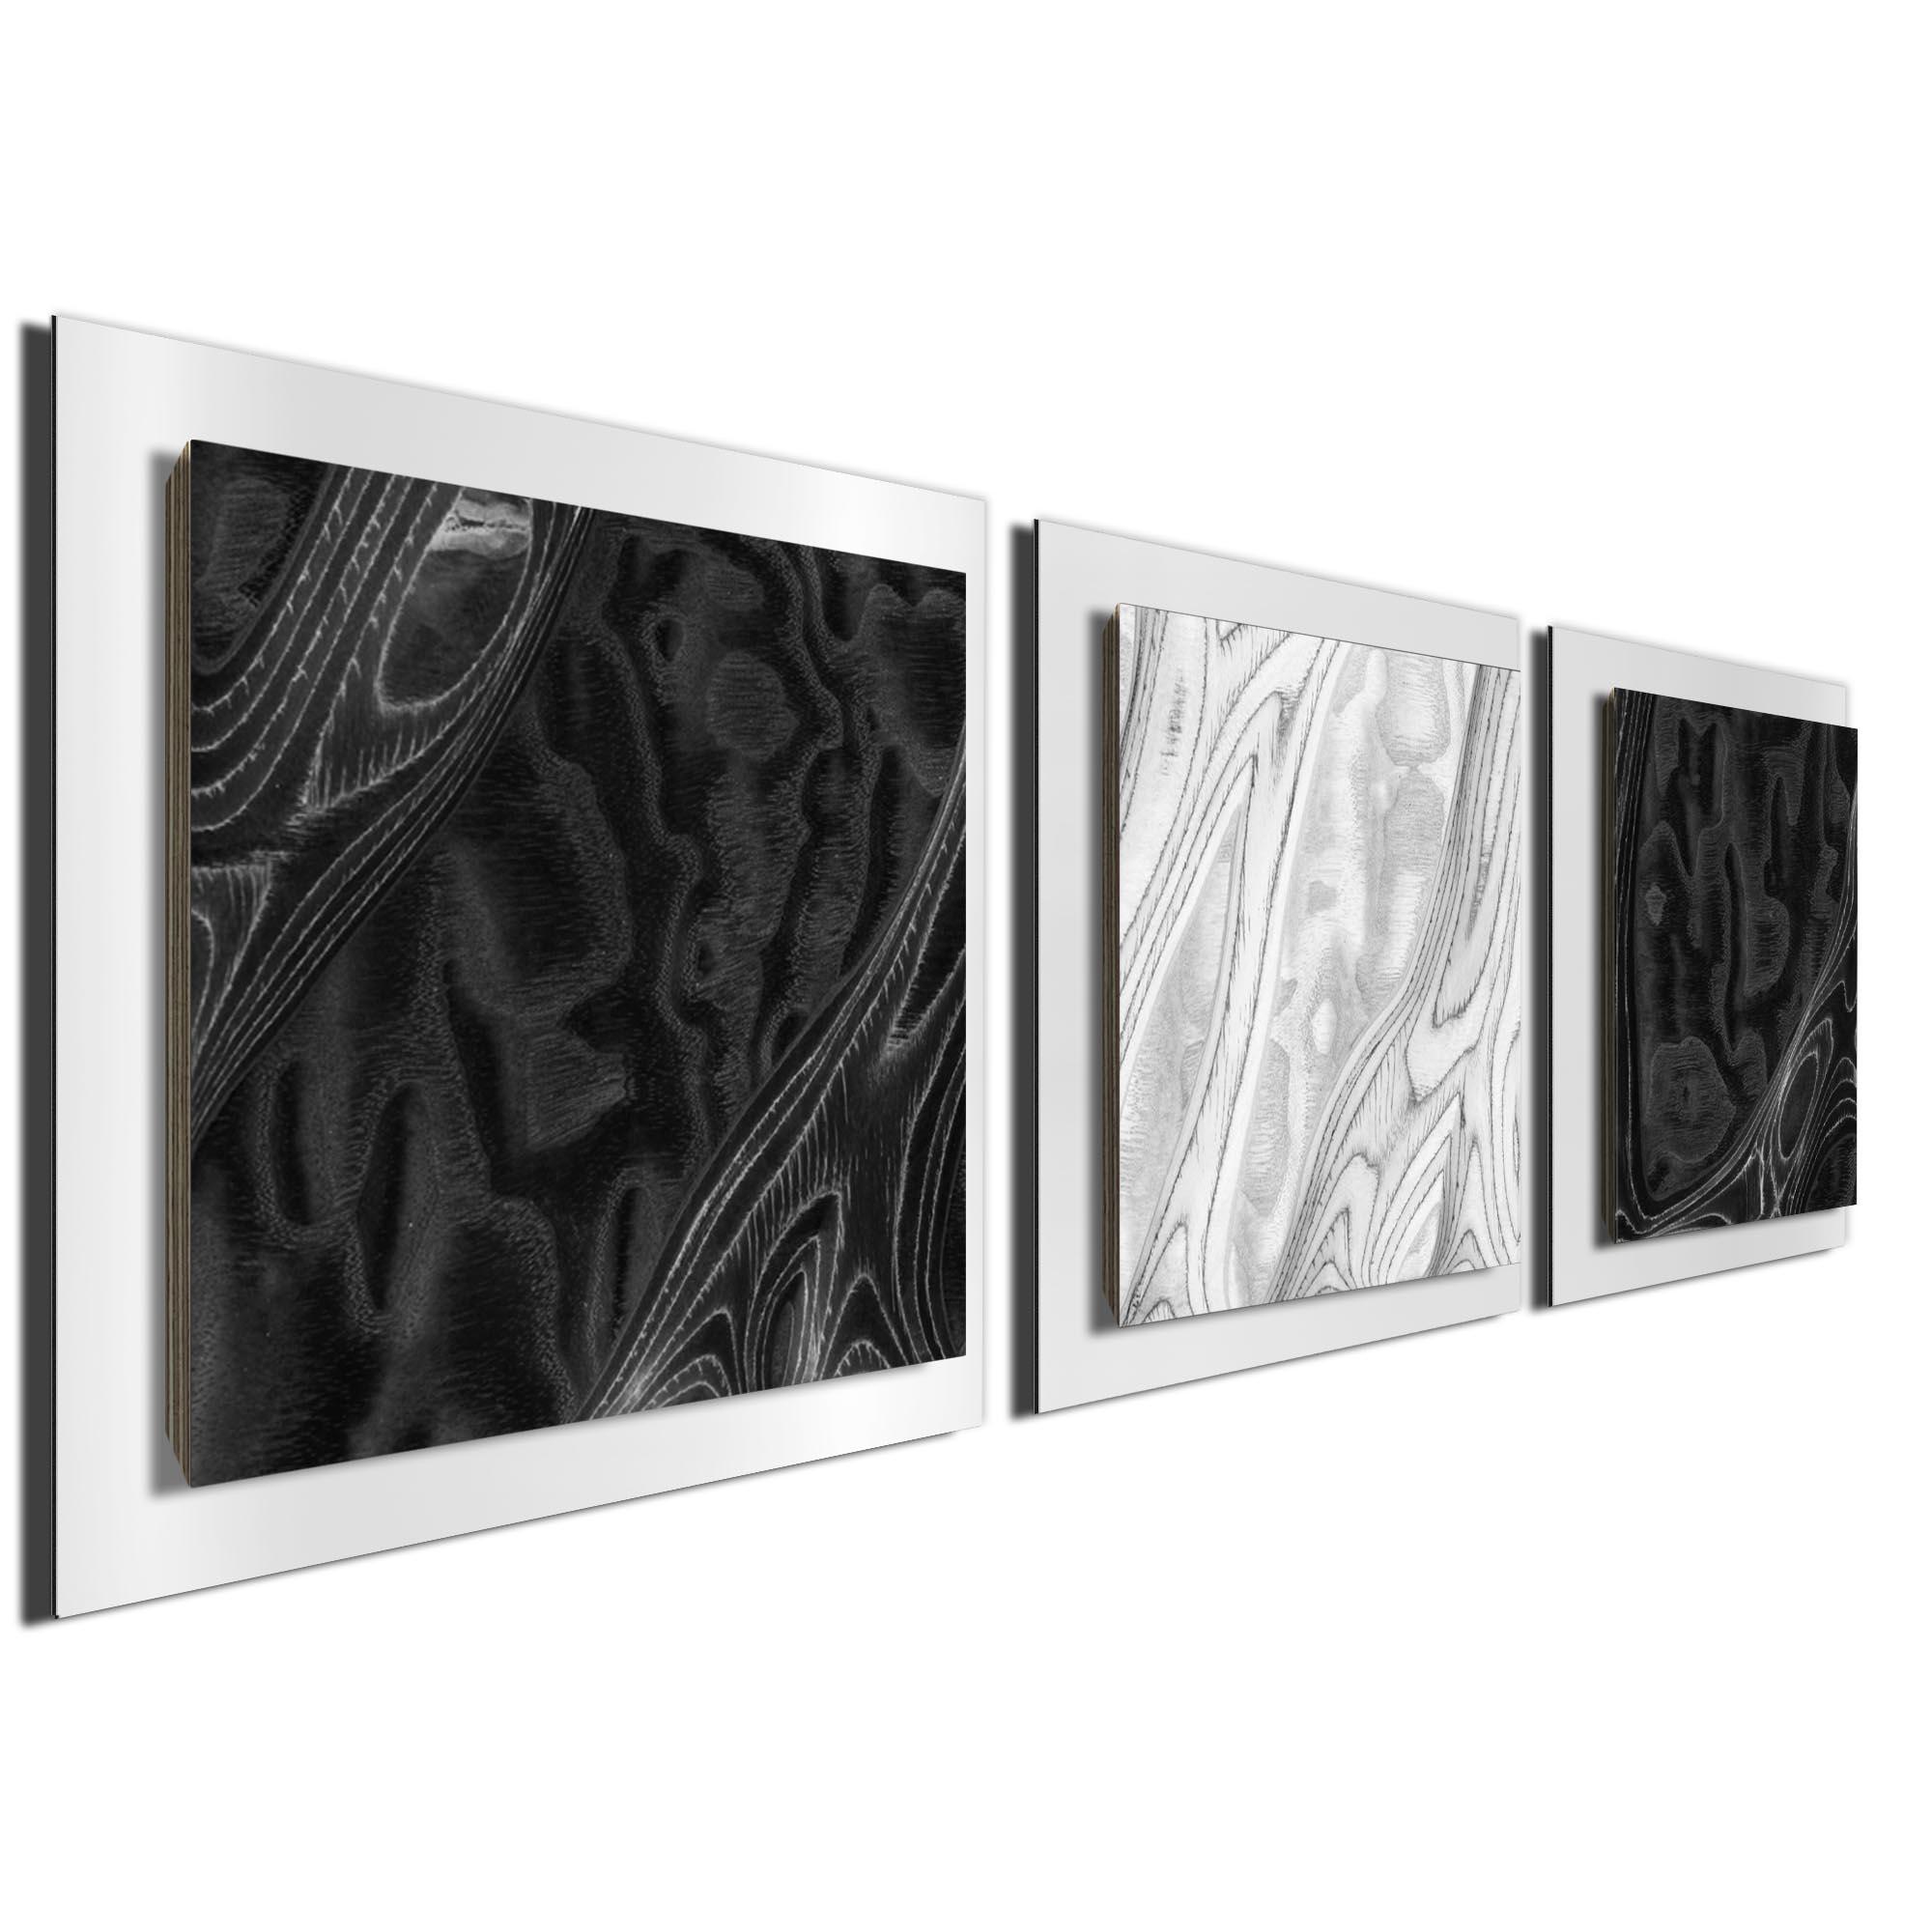 BWB Burl Essence White by Jackson Wright Rustic Modern Style Wood Wall Art - Image 2